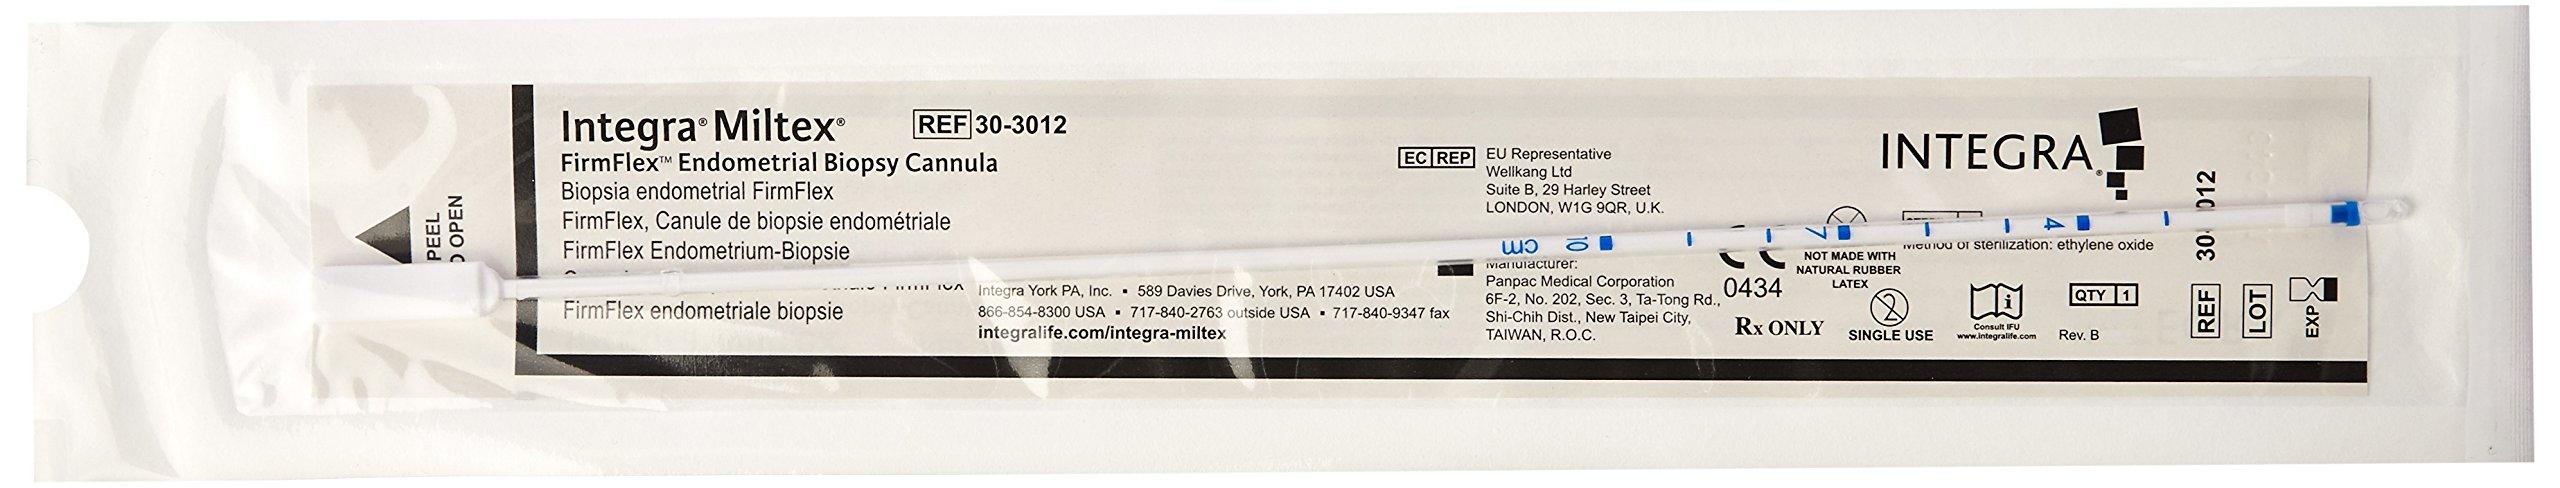 Miltex 30-3012 FirmFlex Endometrial Biopsy Cannula (Pack of 25)